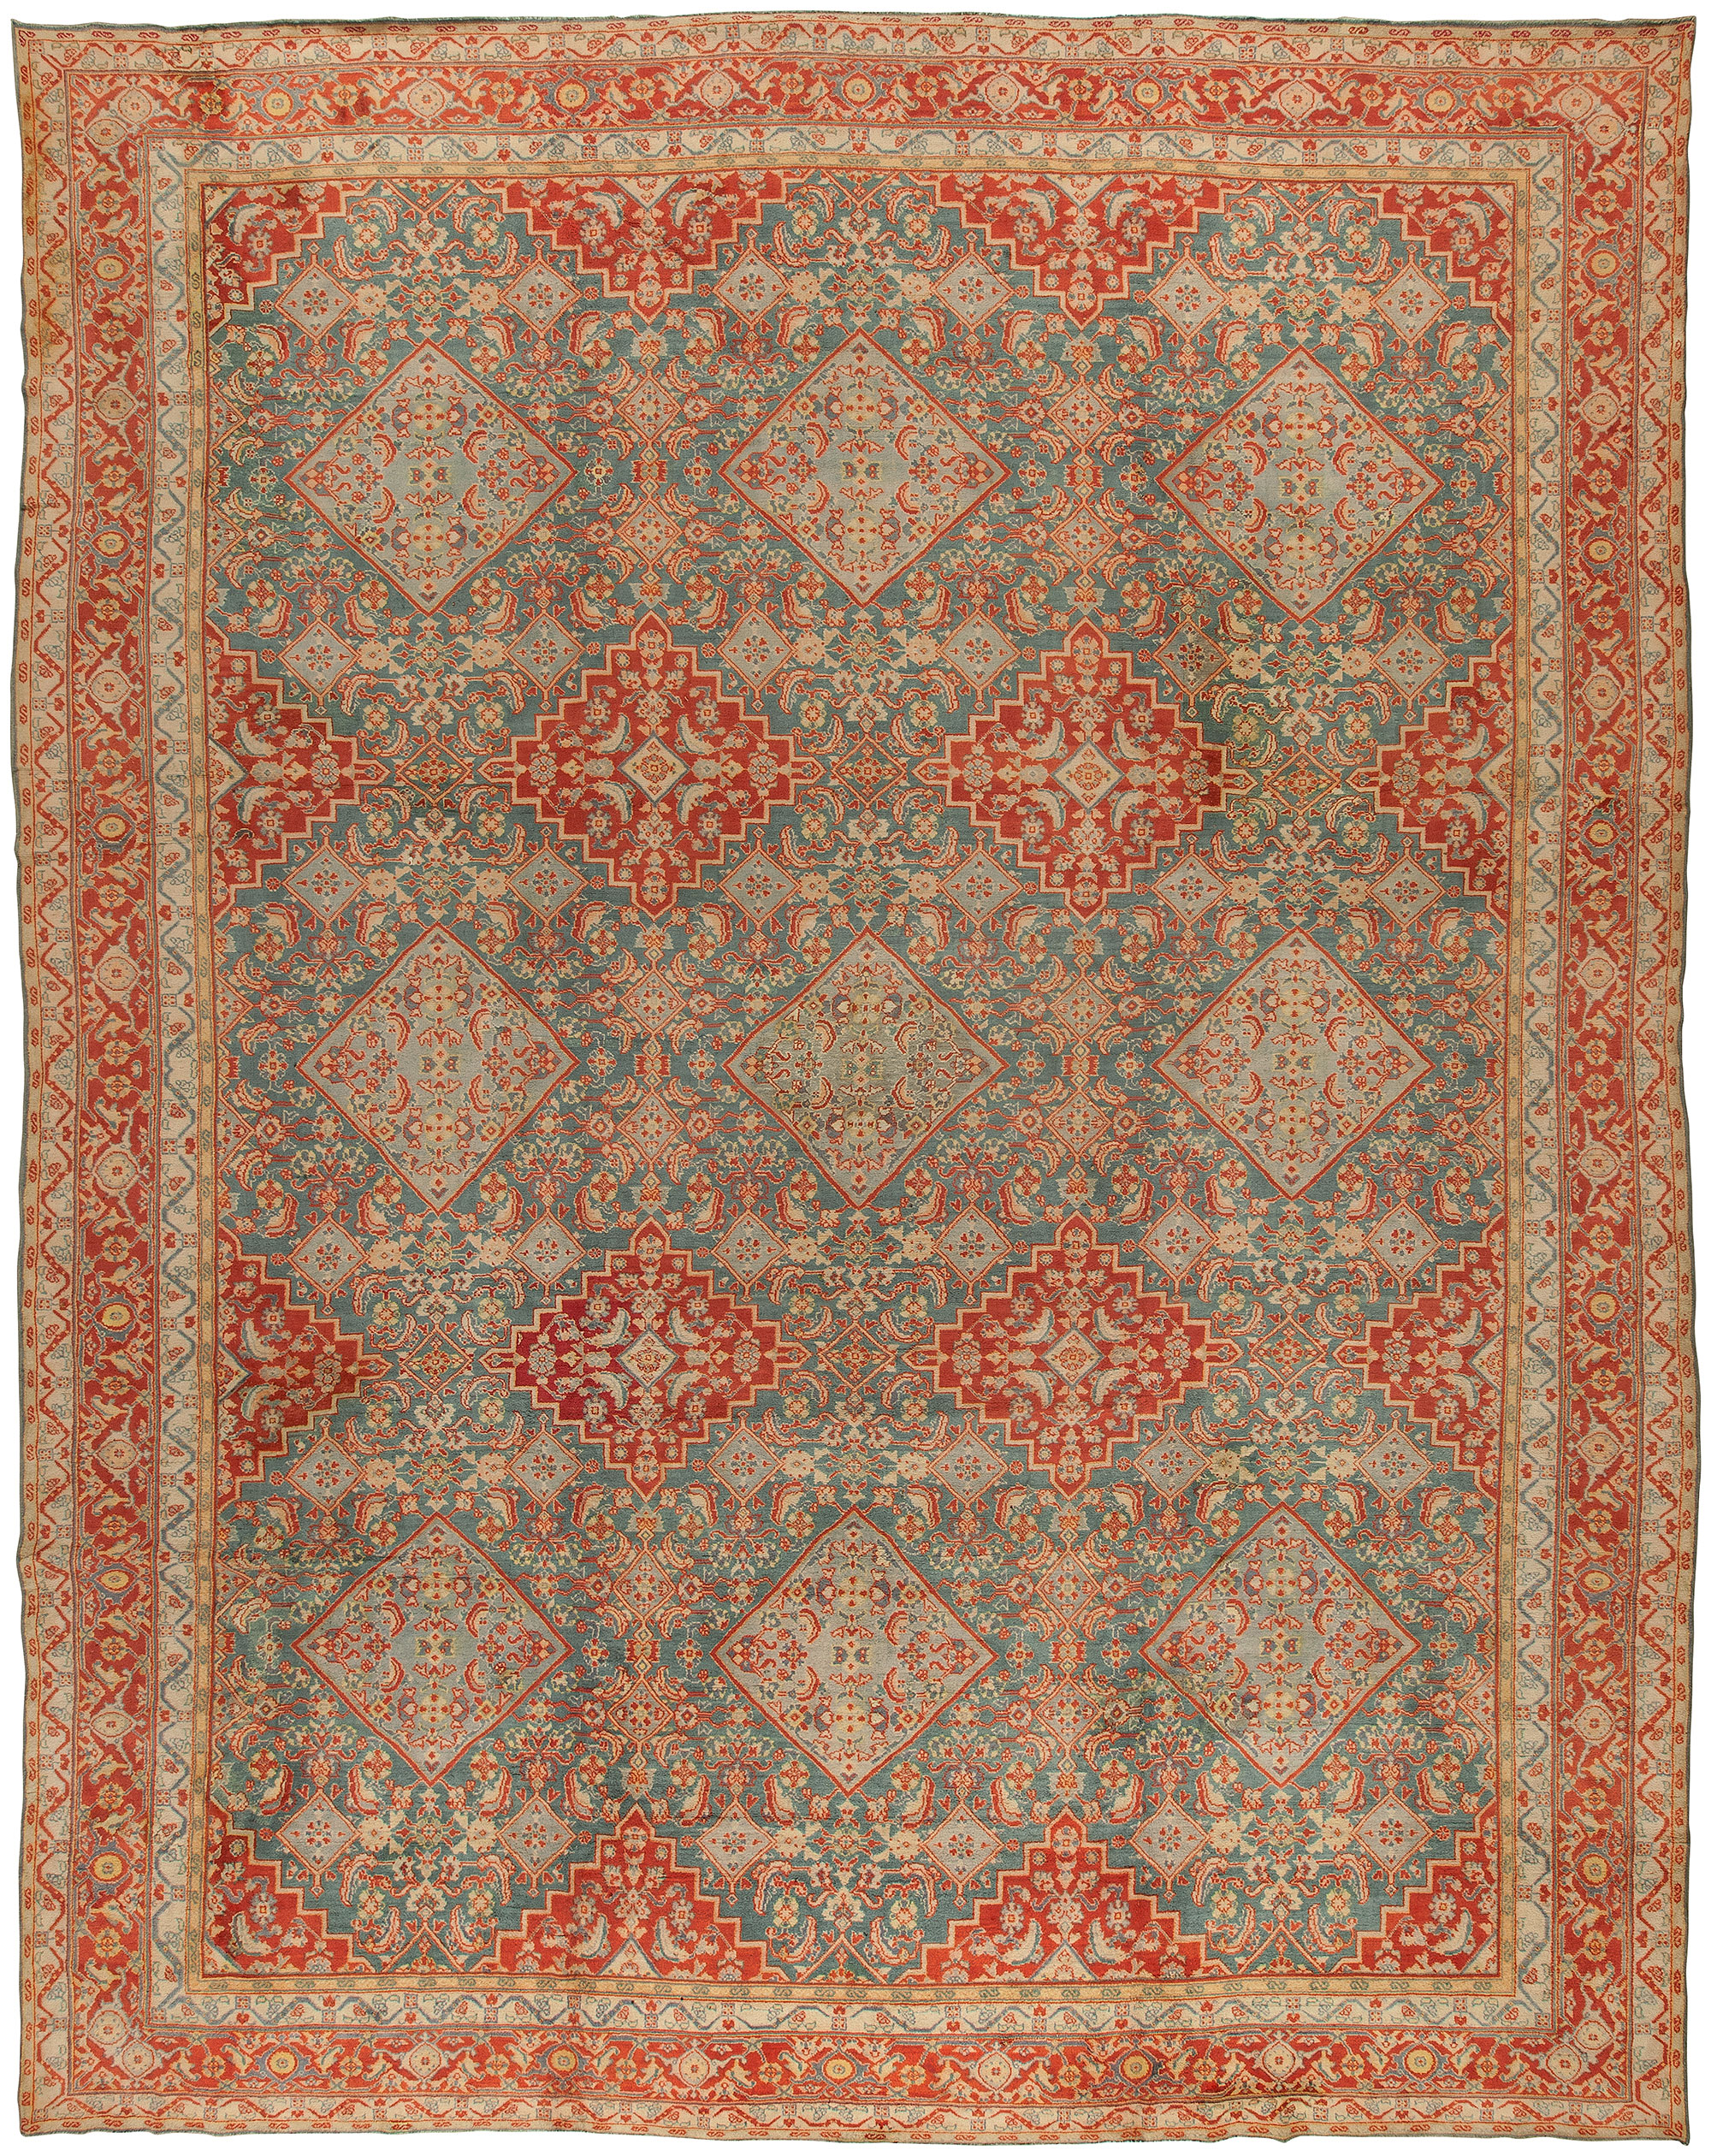 Antique cotton Indian Agra Rug BB0912